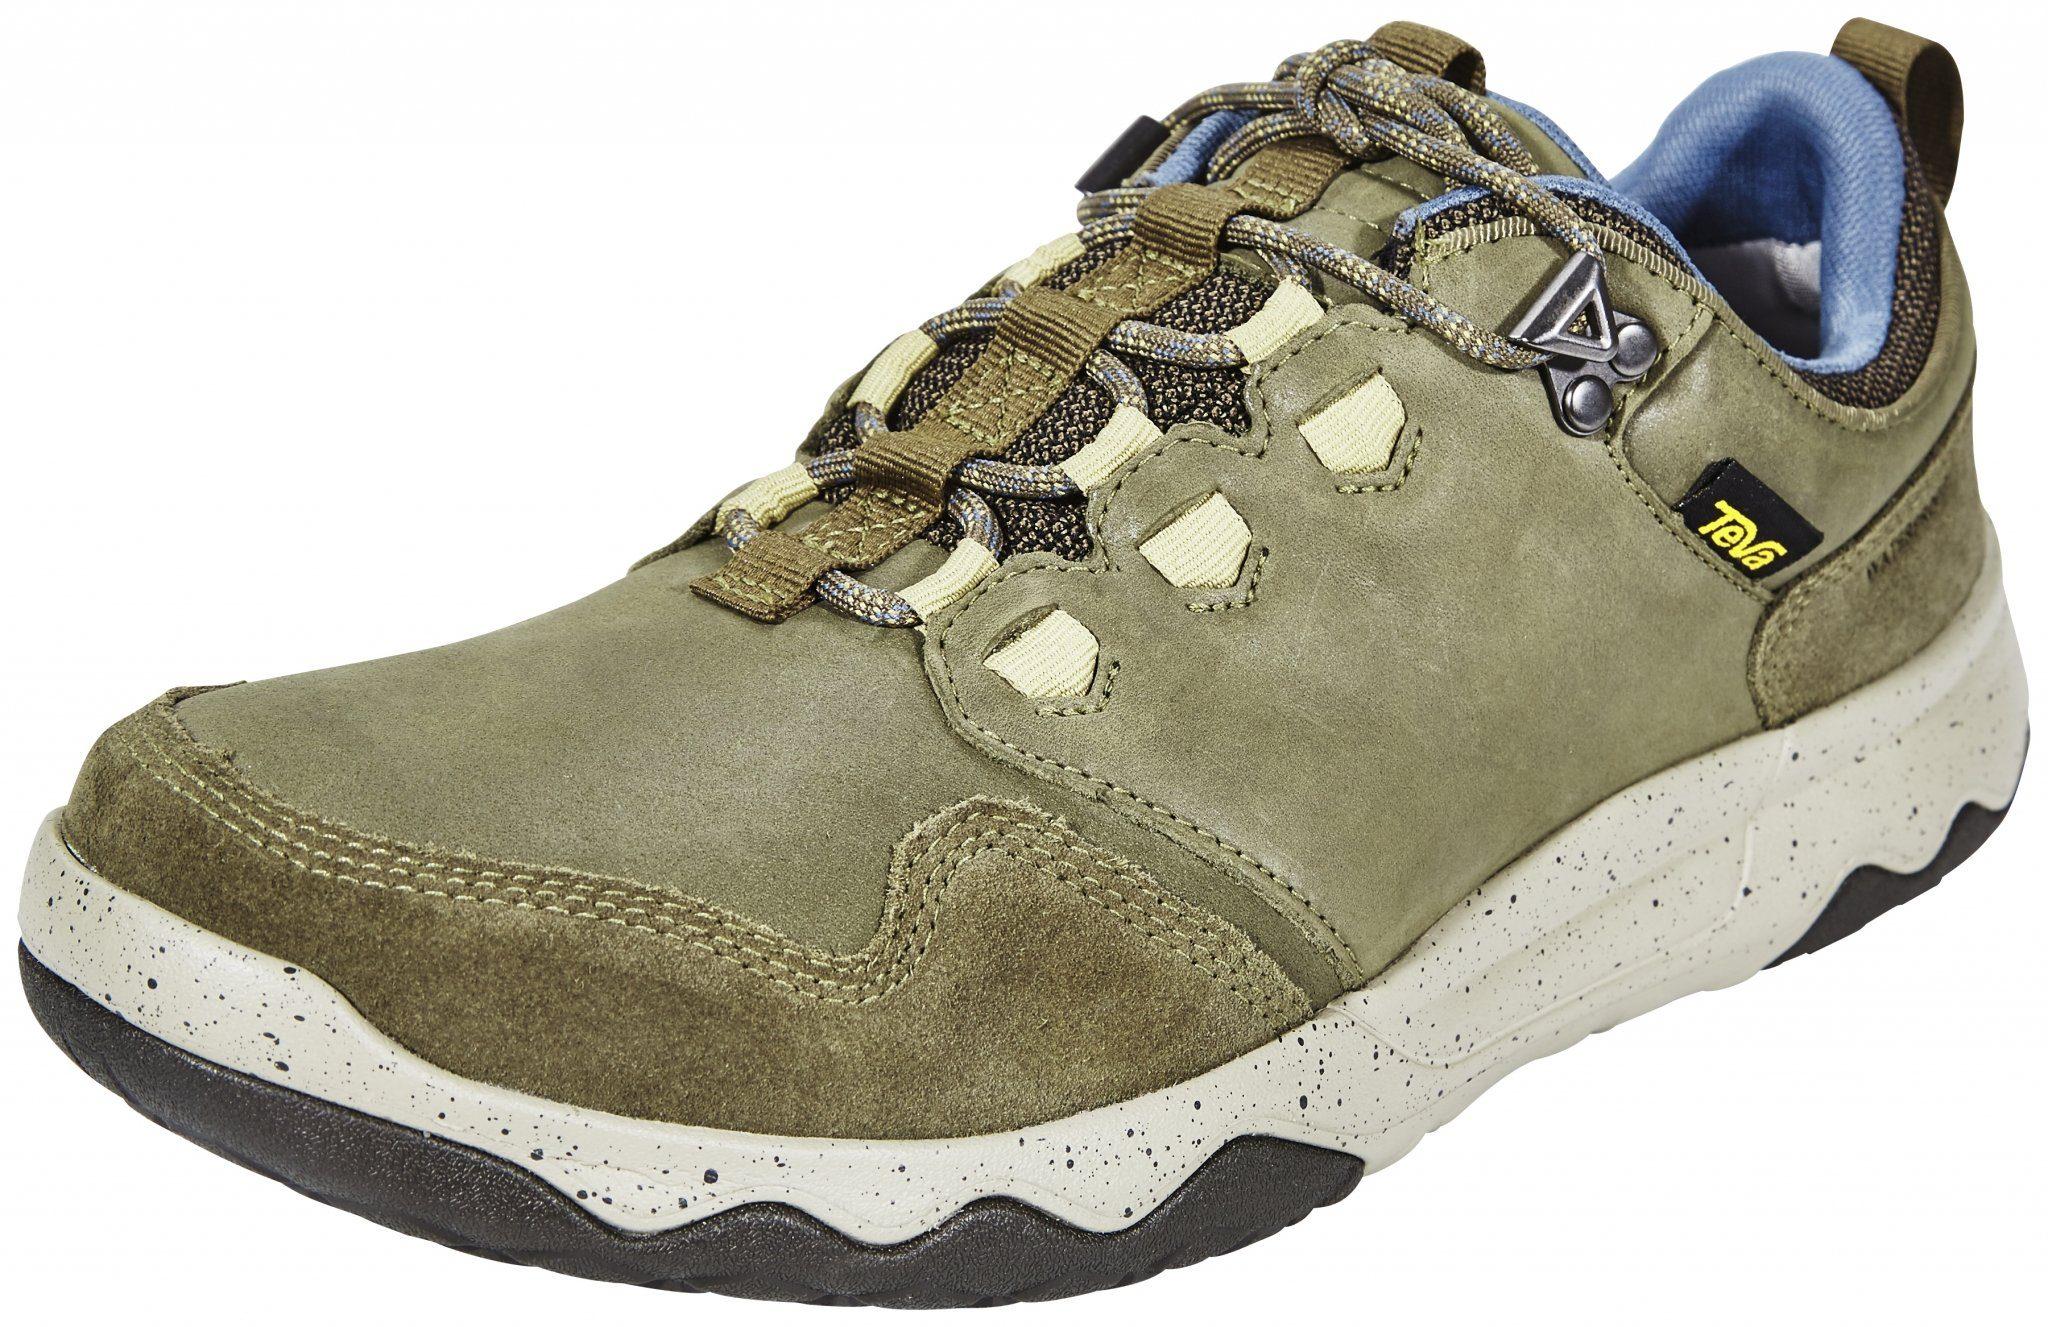 Teva Kletterschuh »Teva Arrowood Lux WP Shoes Men«